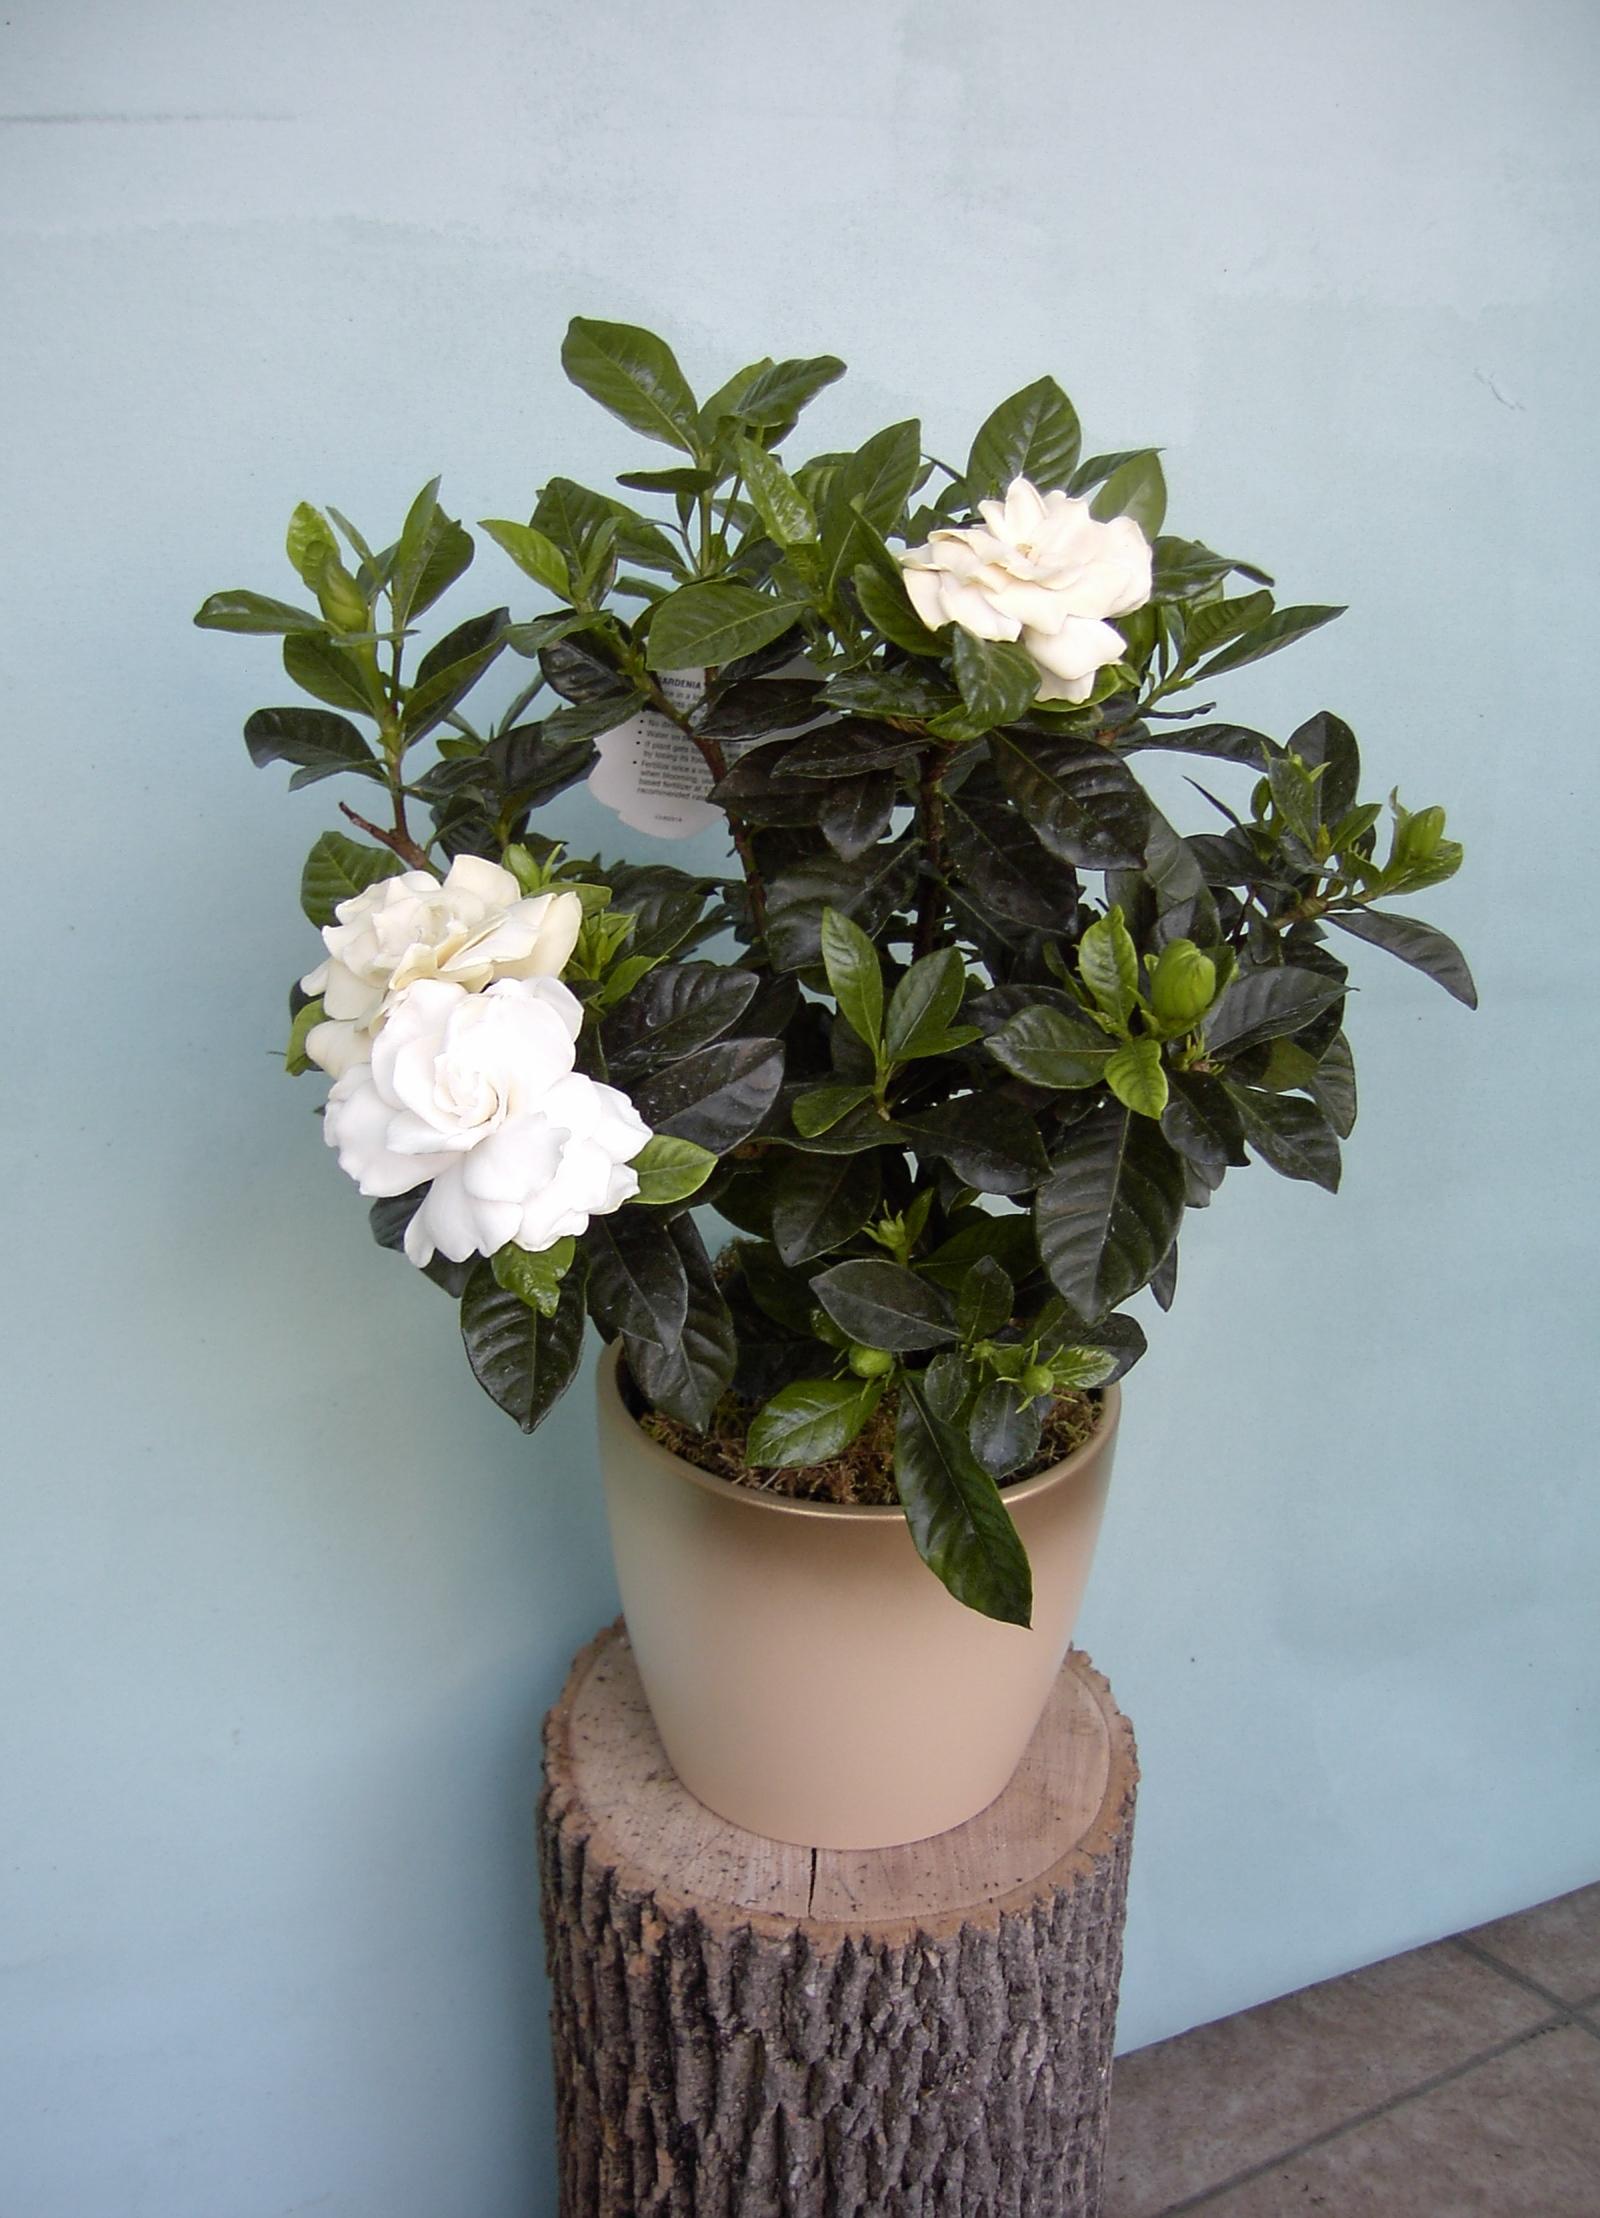 helleborus and gardenia plants